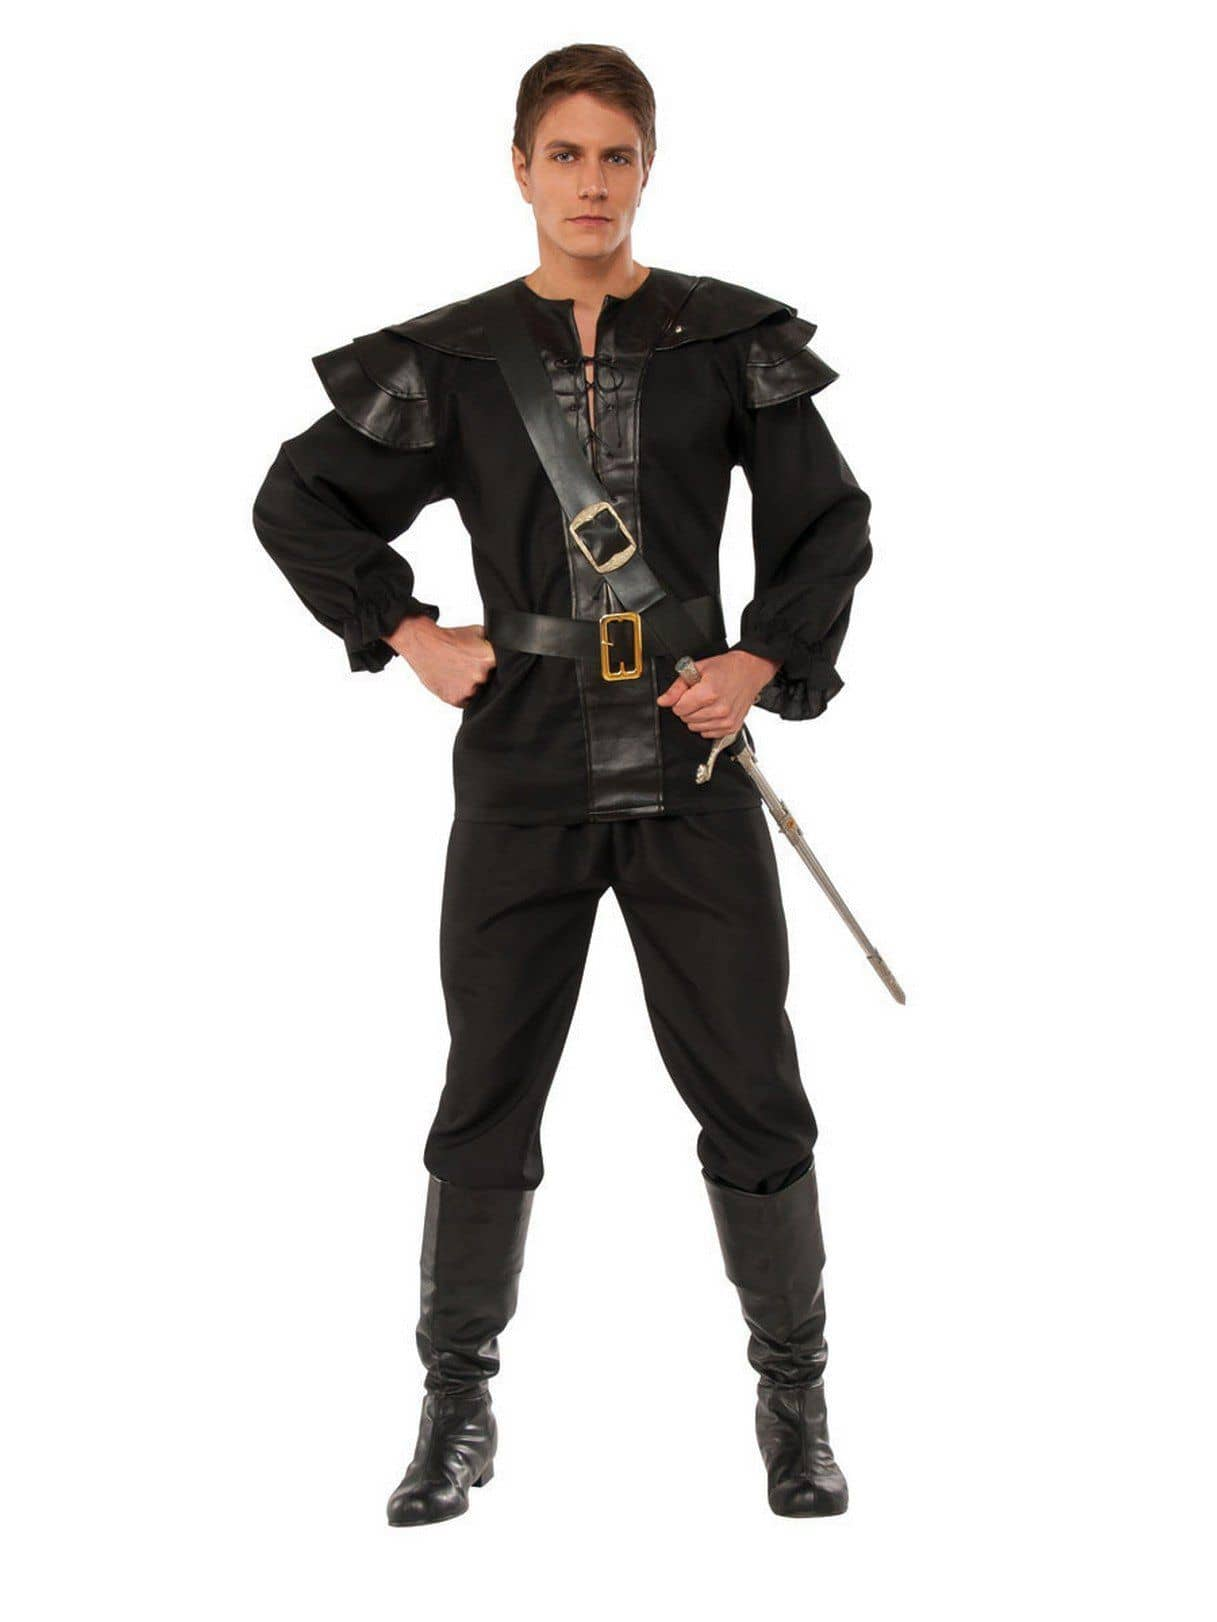 Tattered Pirate Shirt Black Adult Costume